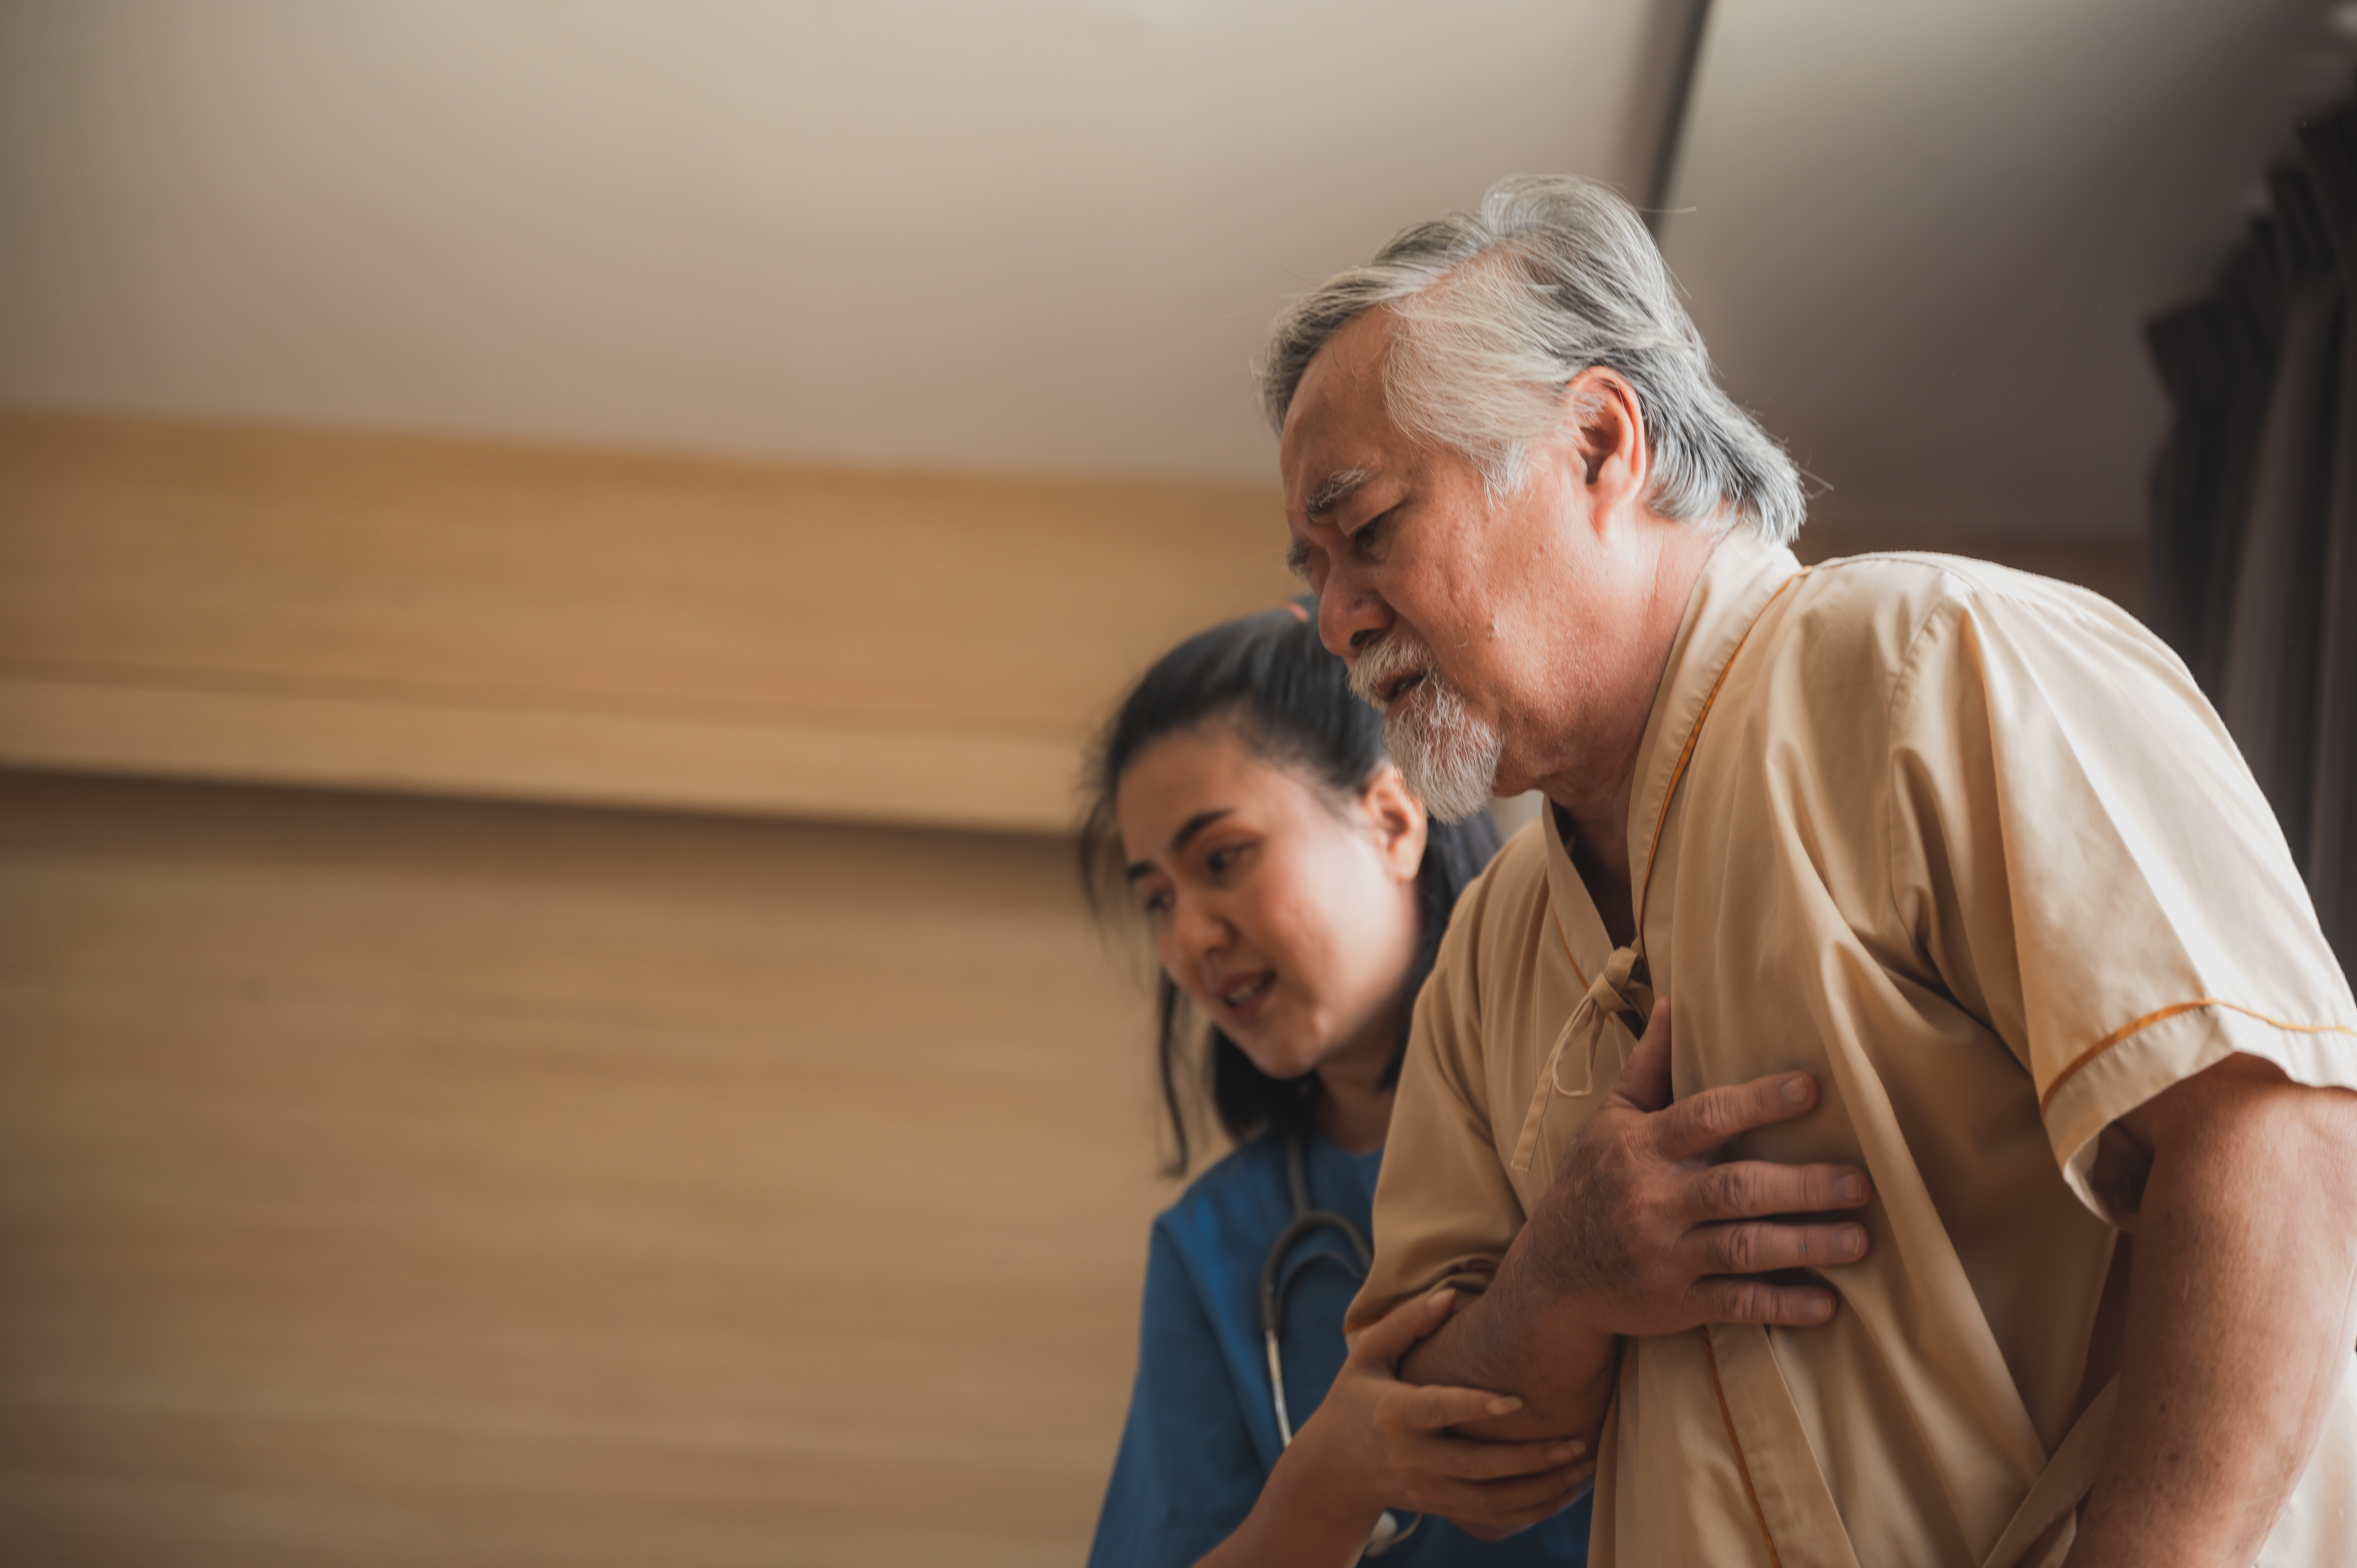 nurse-helping-older-man-walk-in-nursing-home